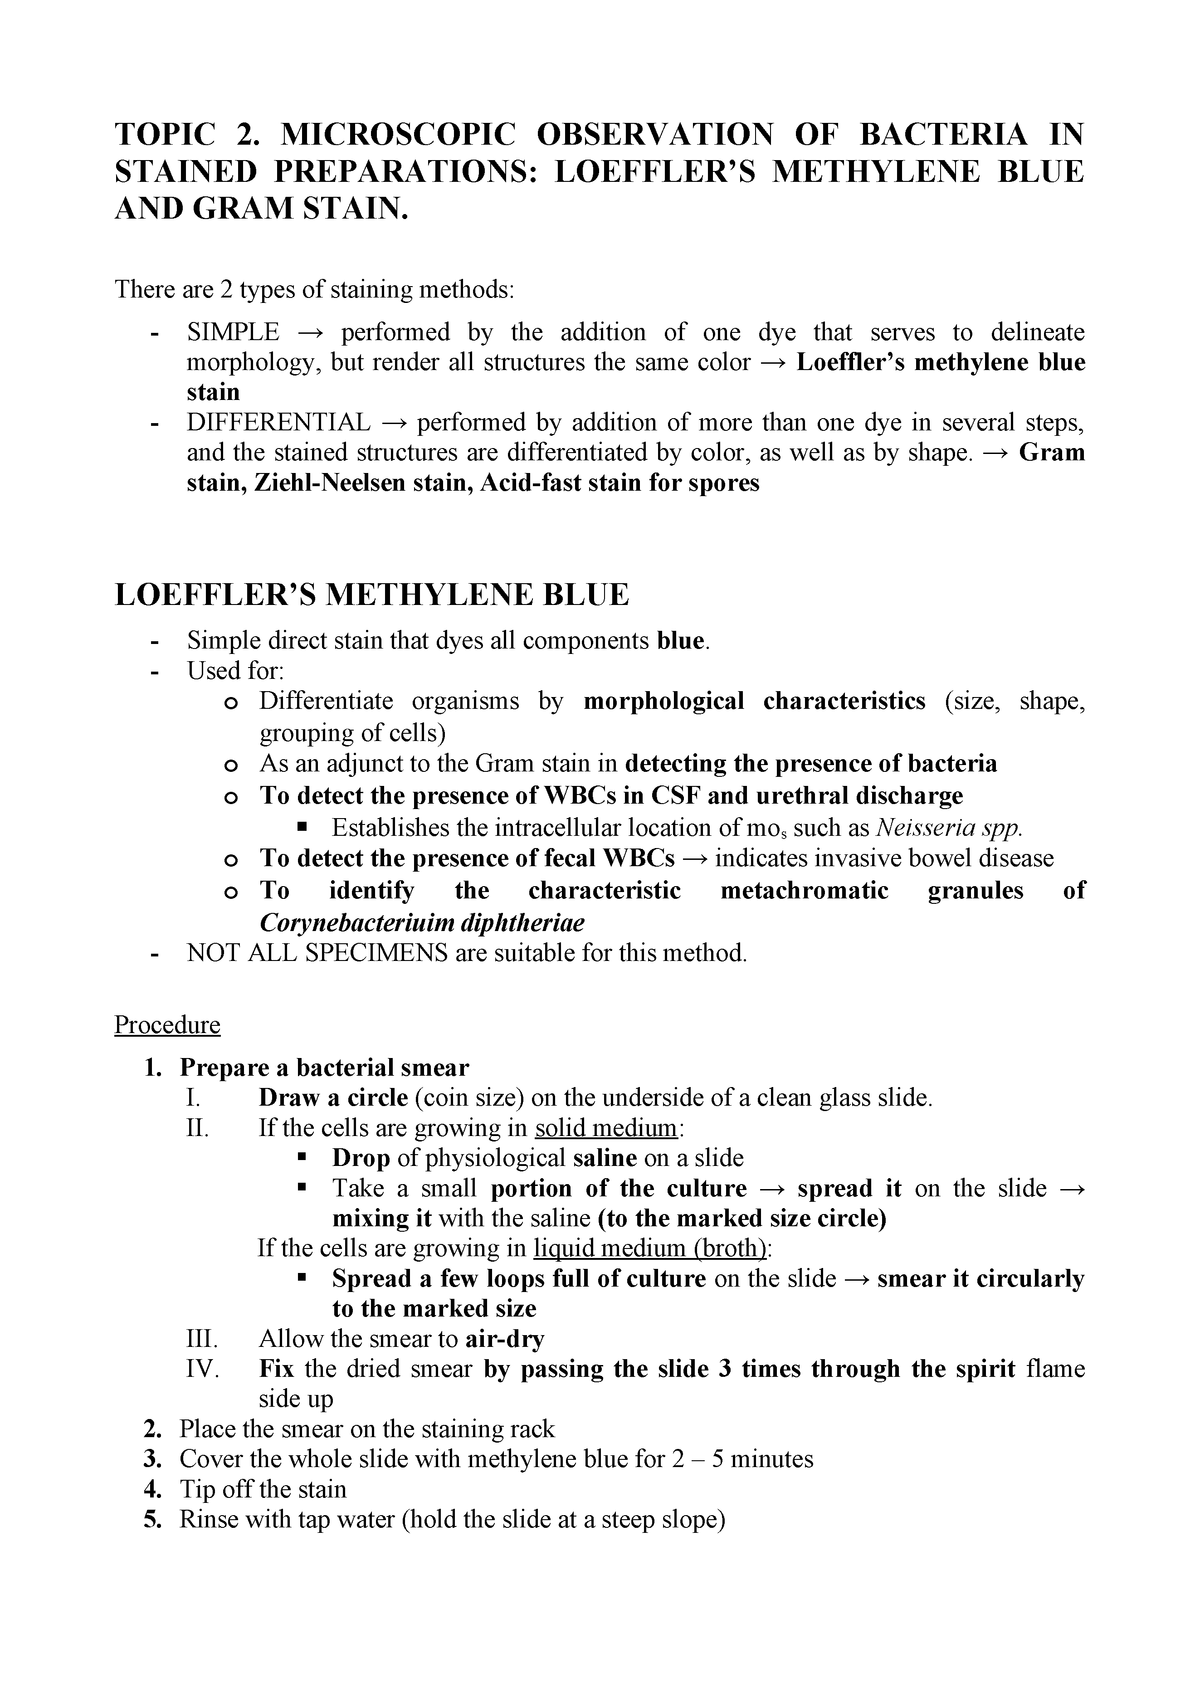 Topic 2 - LABORATORY - Microbiology 16 - StuDocu